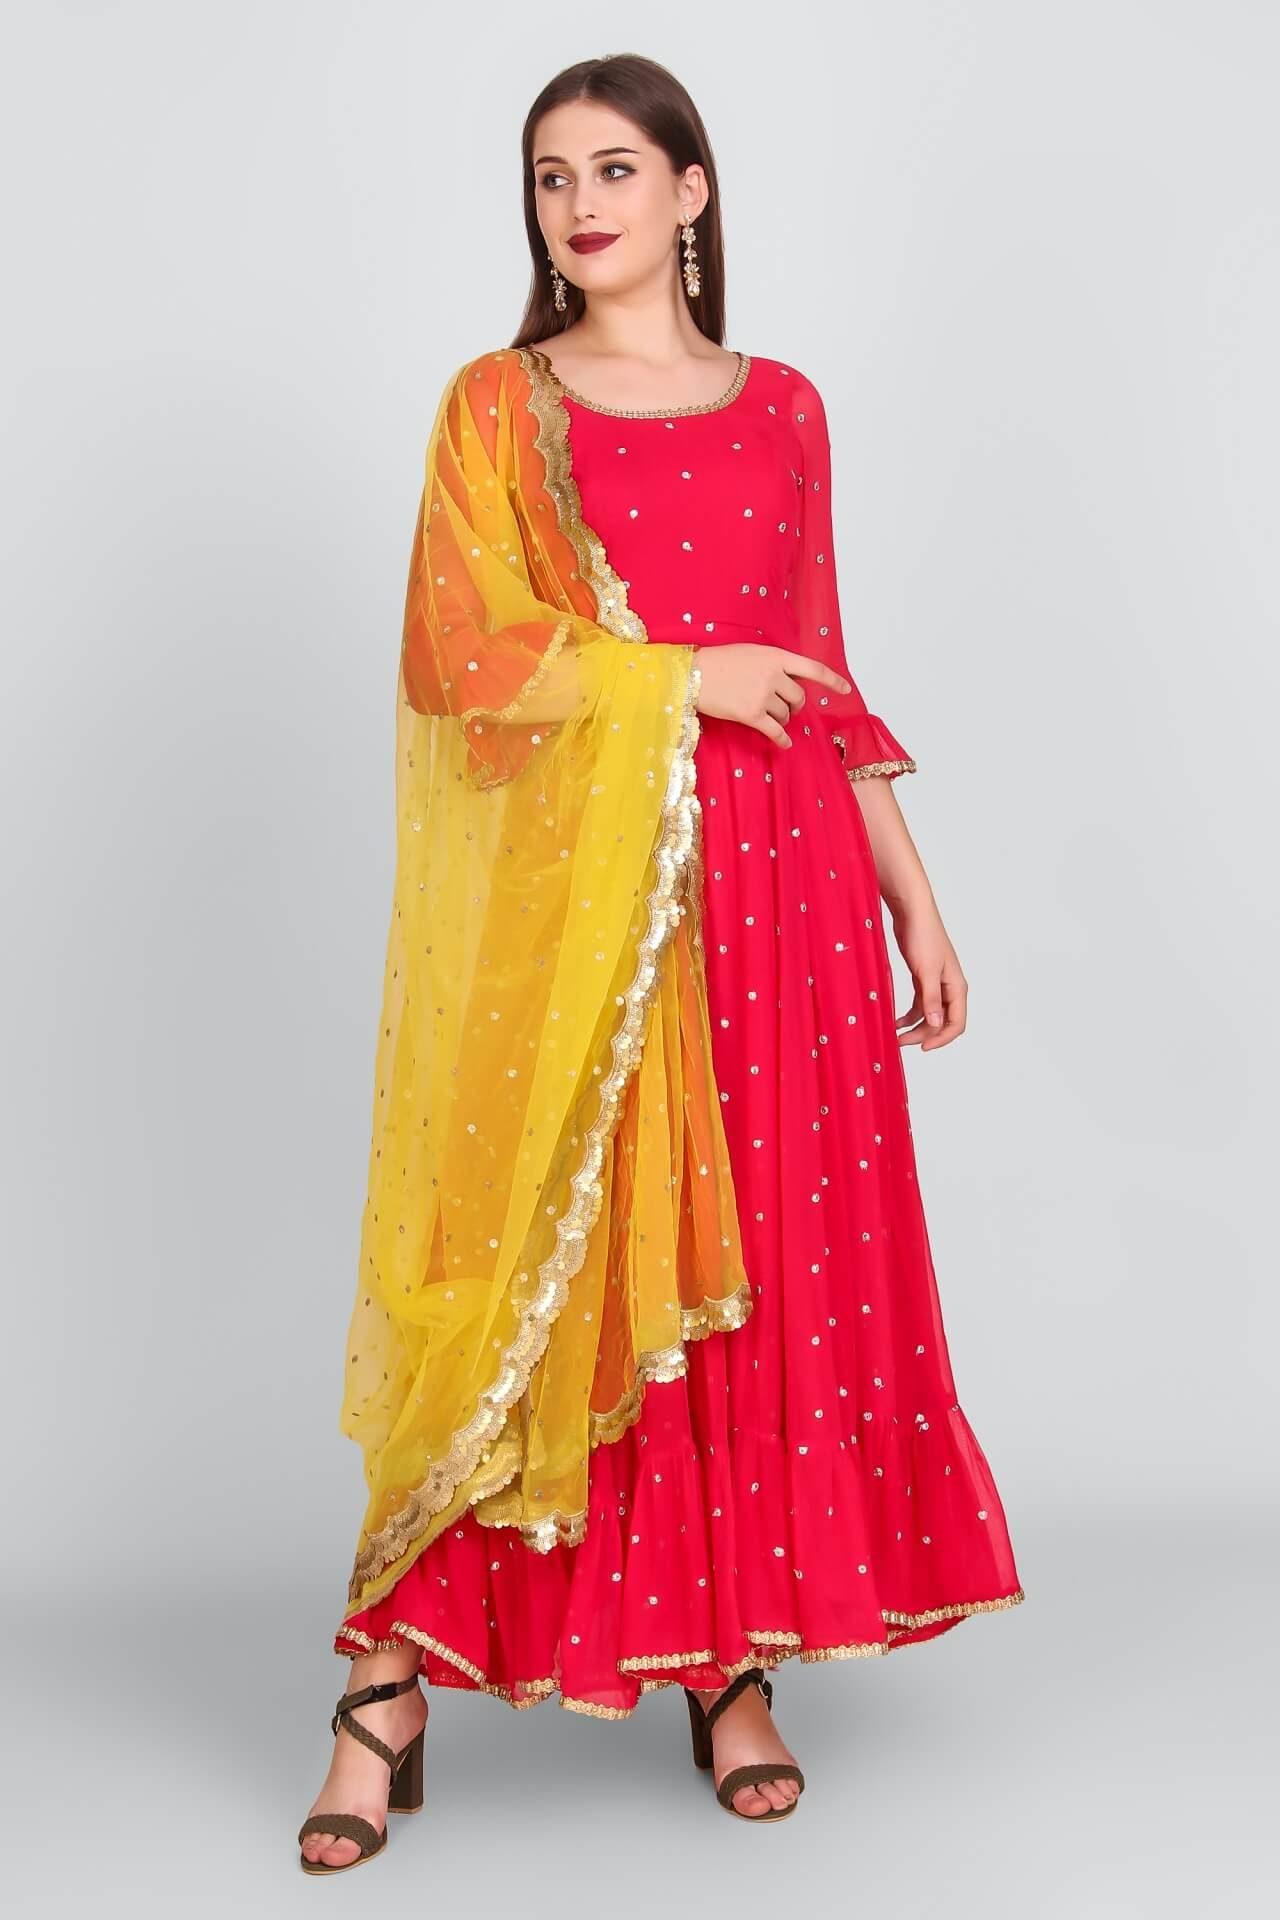 Hot Pink Mukaish Anarkali With Yellow Sequins Dupatta